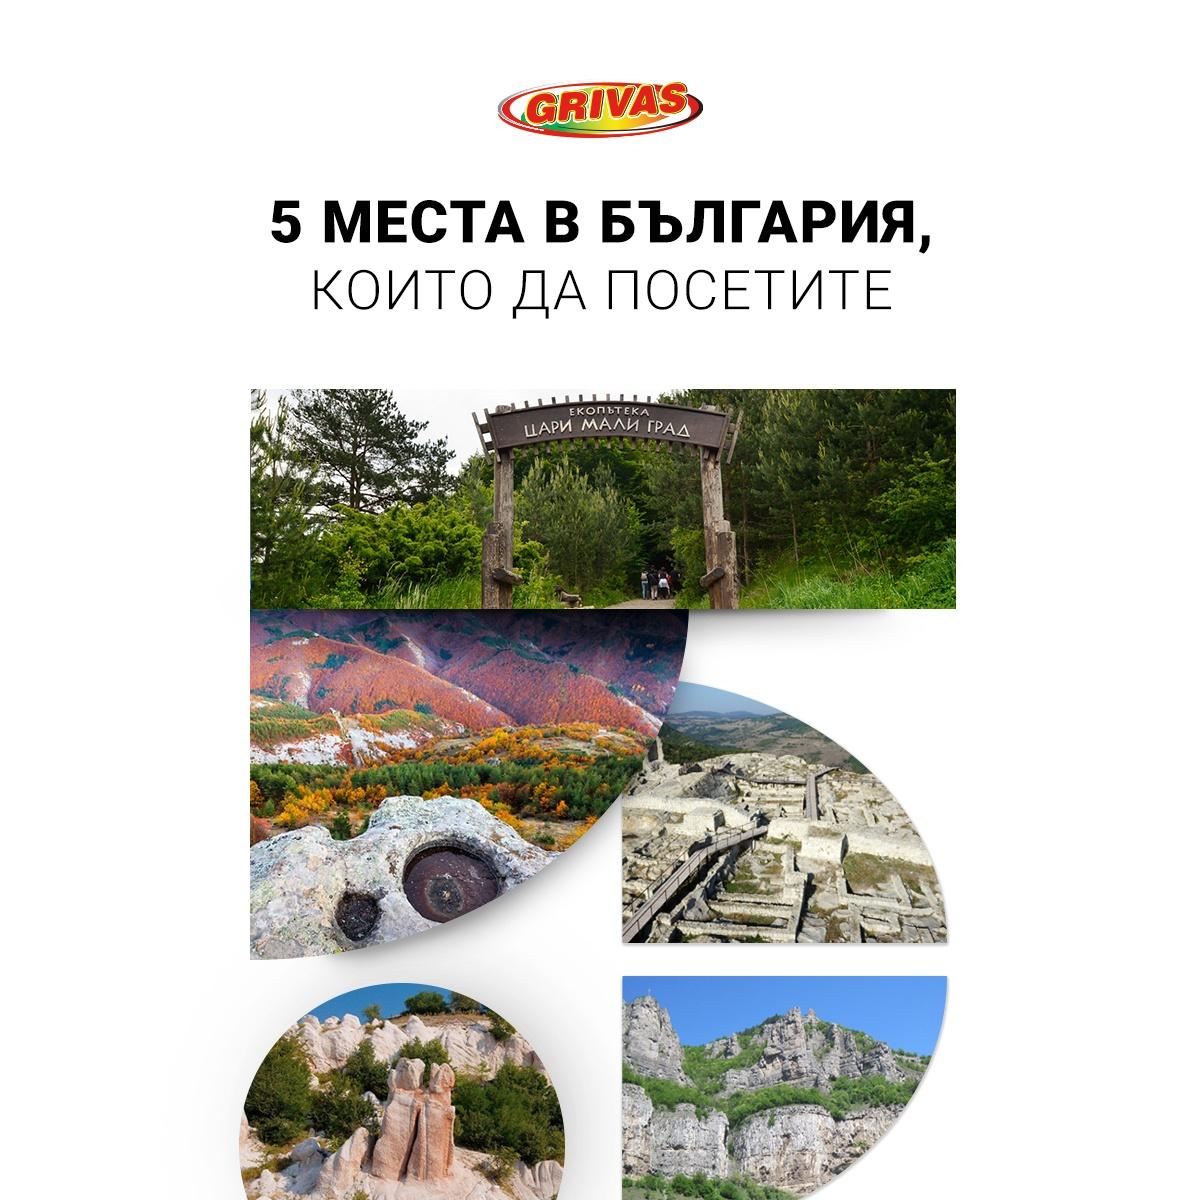 bulgaria, sightseeing